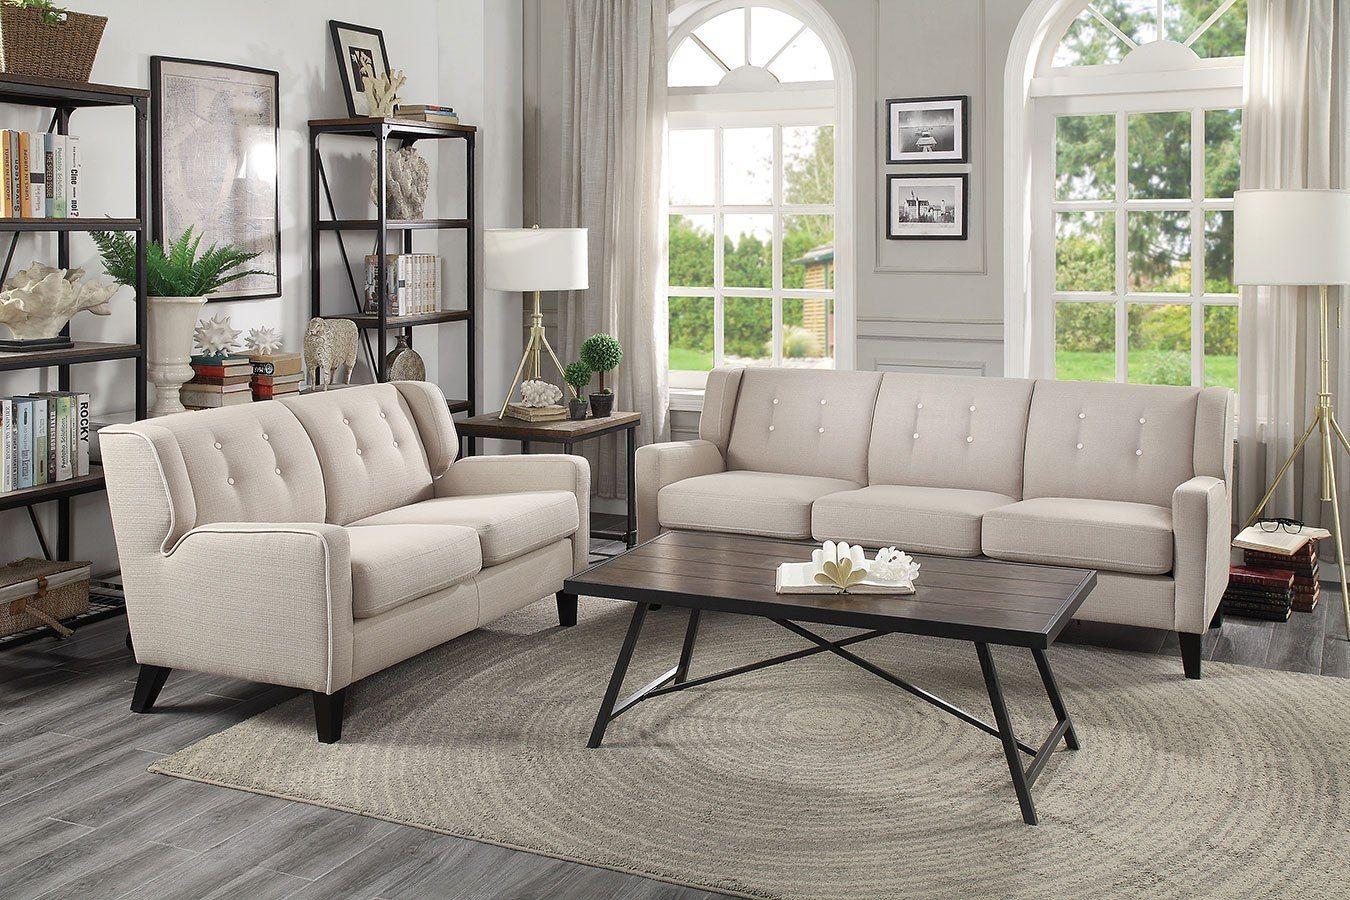 Best Roweena Living Room Set Beige Living Room Sets Beige 640 x 480